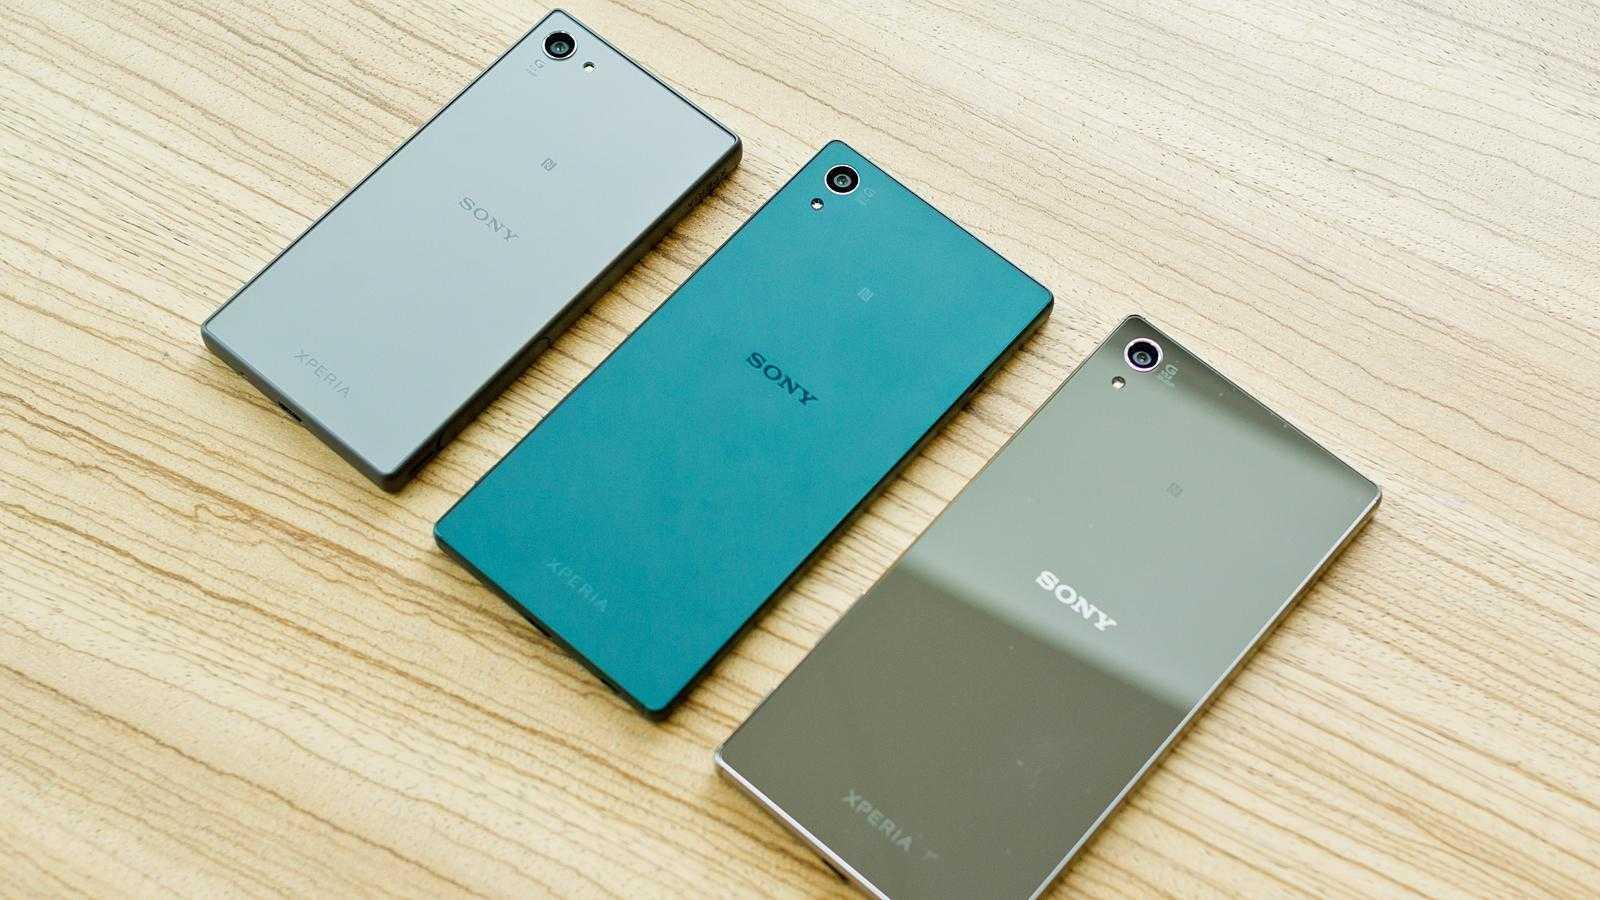 Sony Xperia Z5 compared review 82 - IFA 2015. Sony представила смартфоны Xperia Z5, Z5 Compact и Z5 Premium